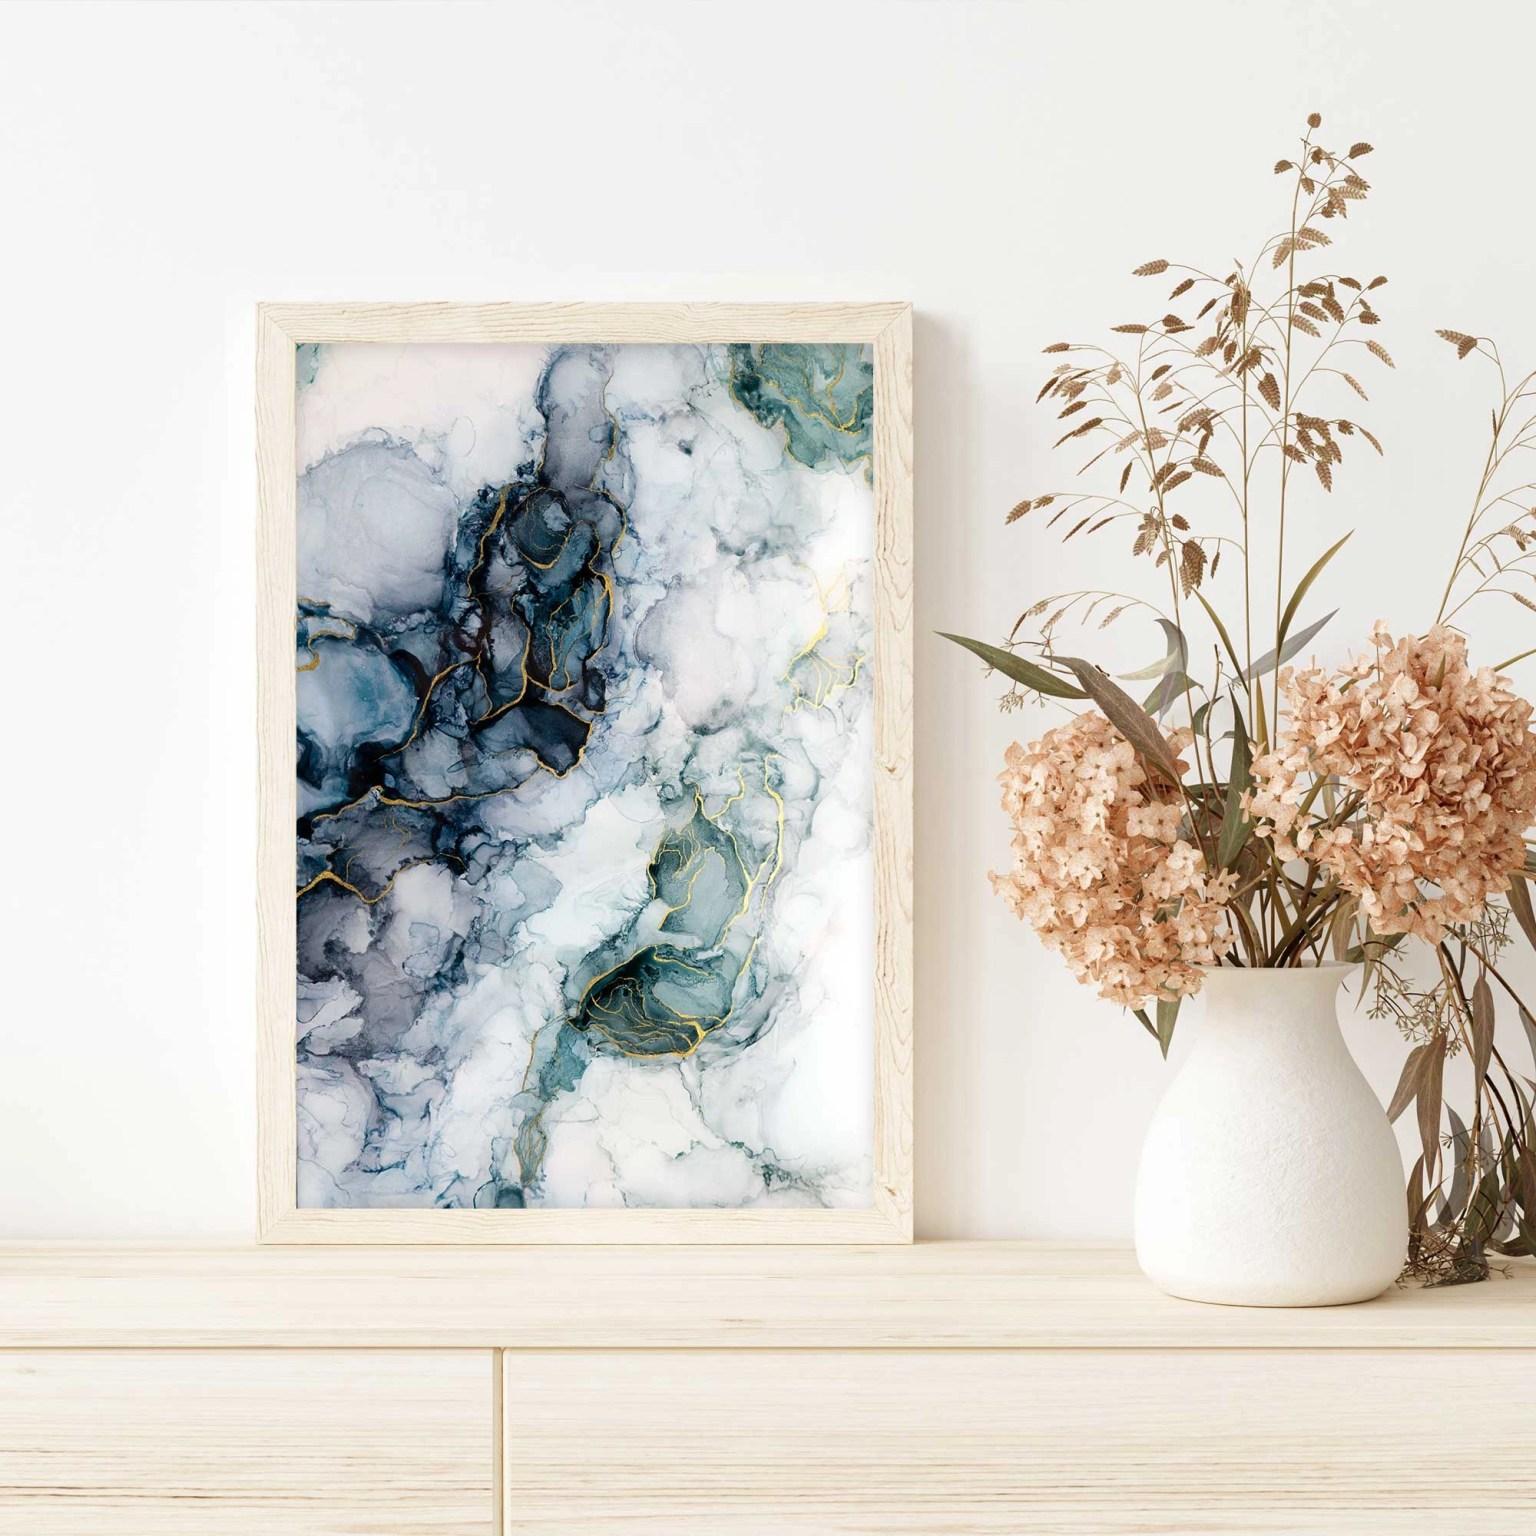 Illyra fine art print by Frankie Hsu